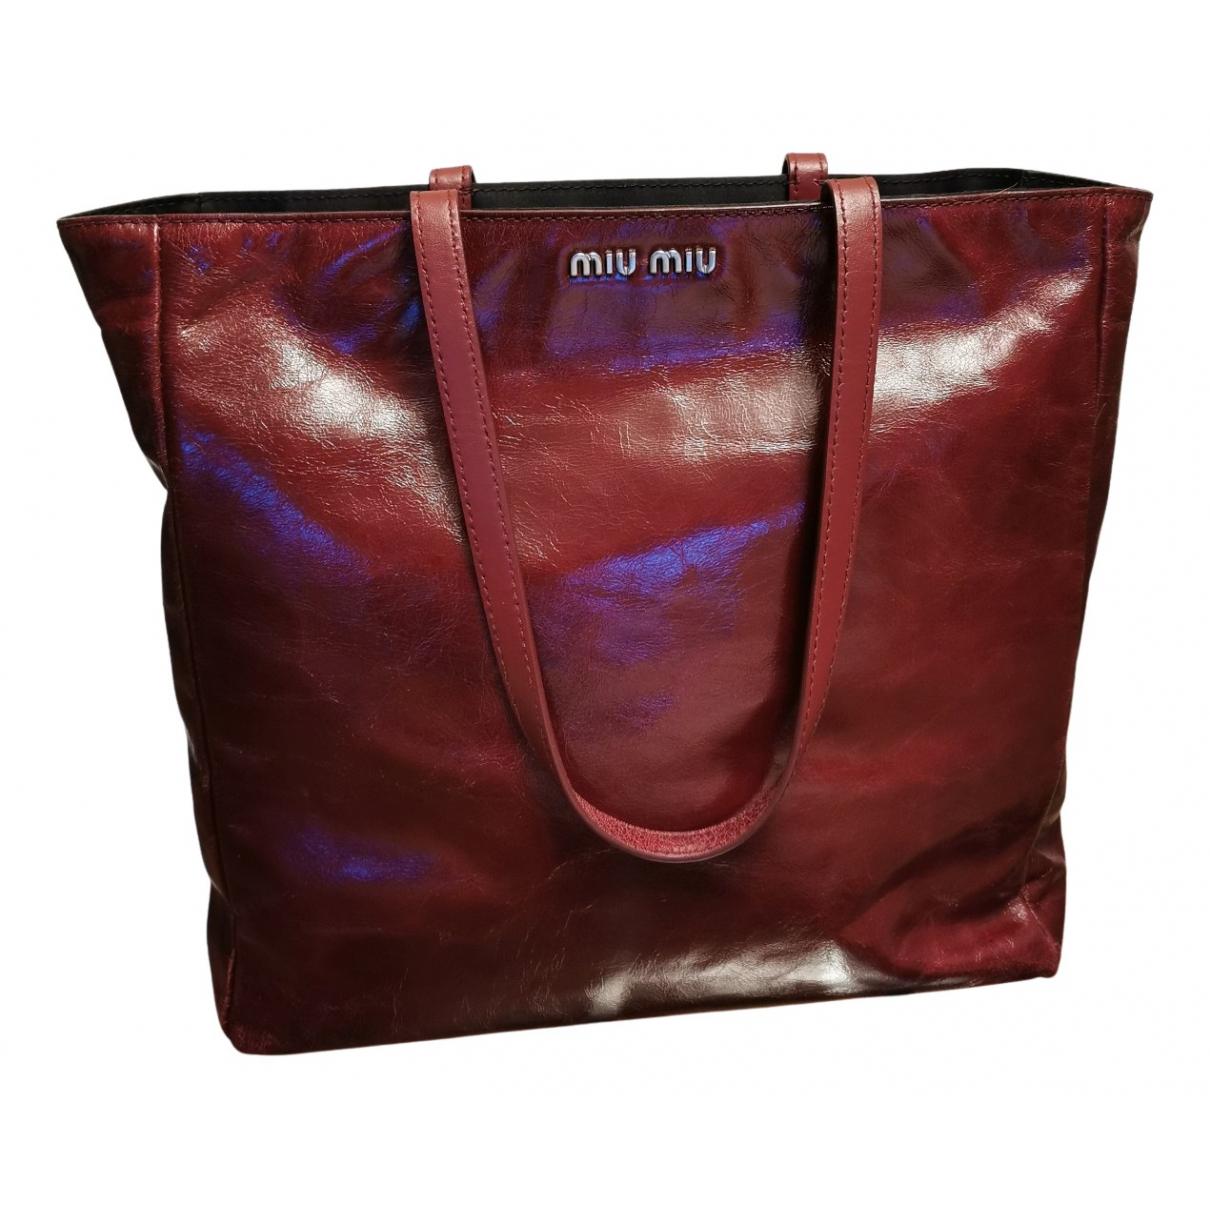 Miu Miu N Burgundy Leather handbag for Women N